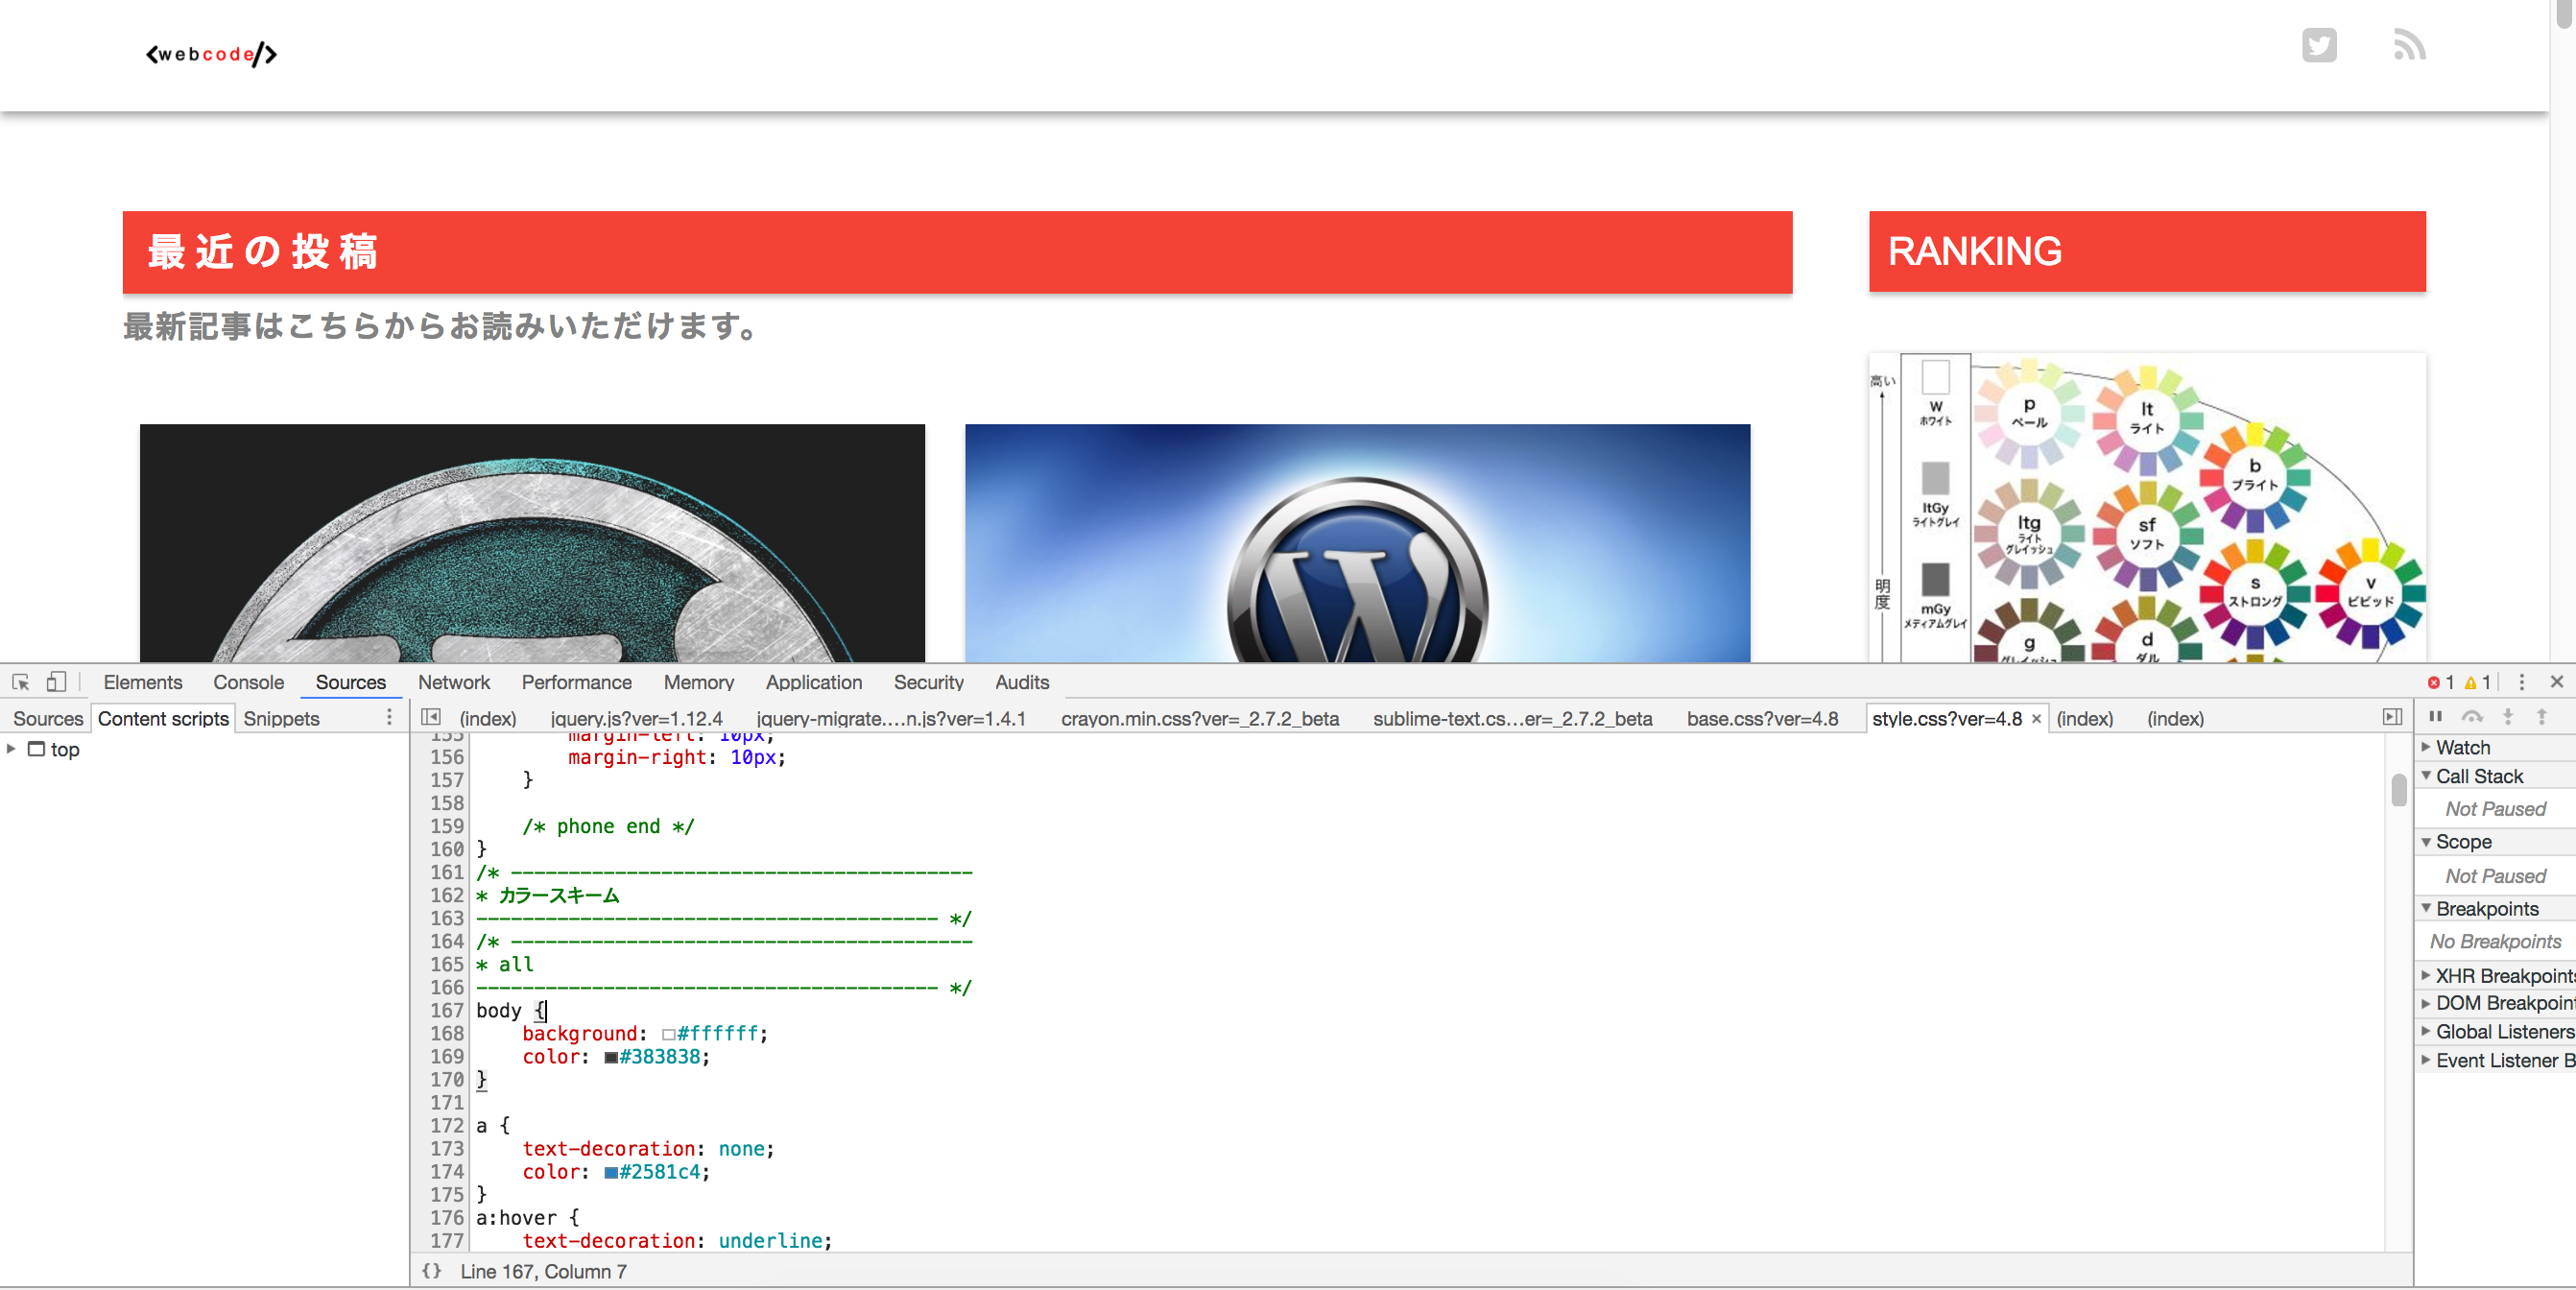 deve2 - WordPressのカスタマイズでオススメ本と簡単なやり方まとめ